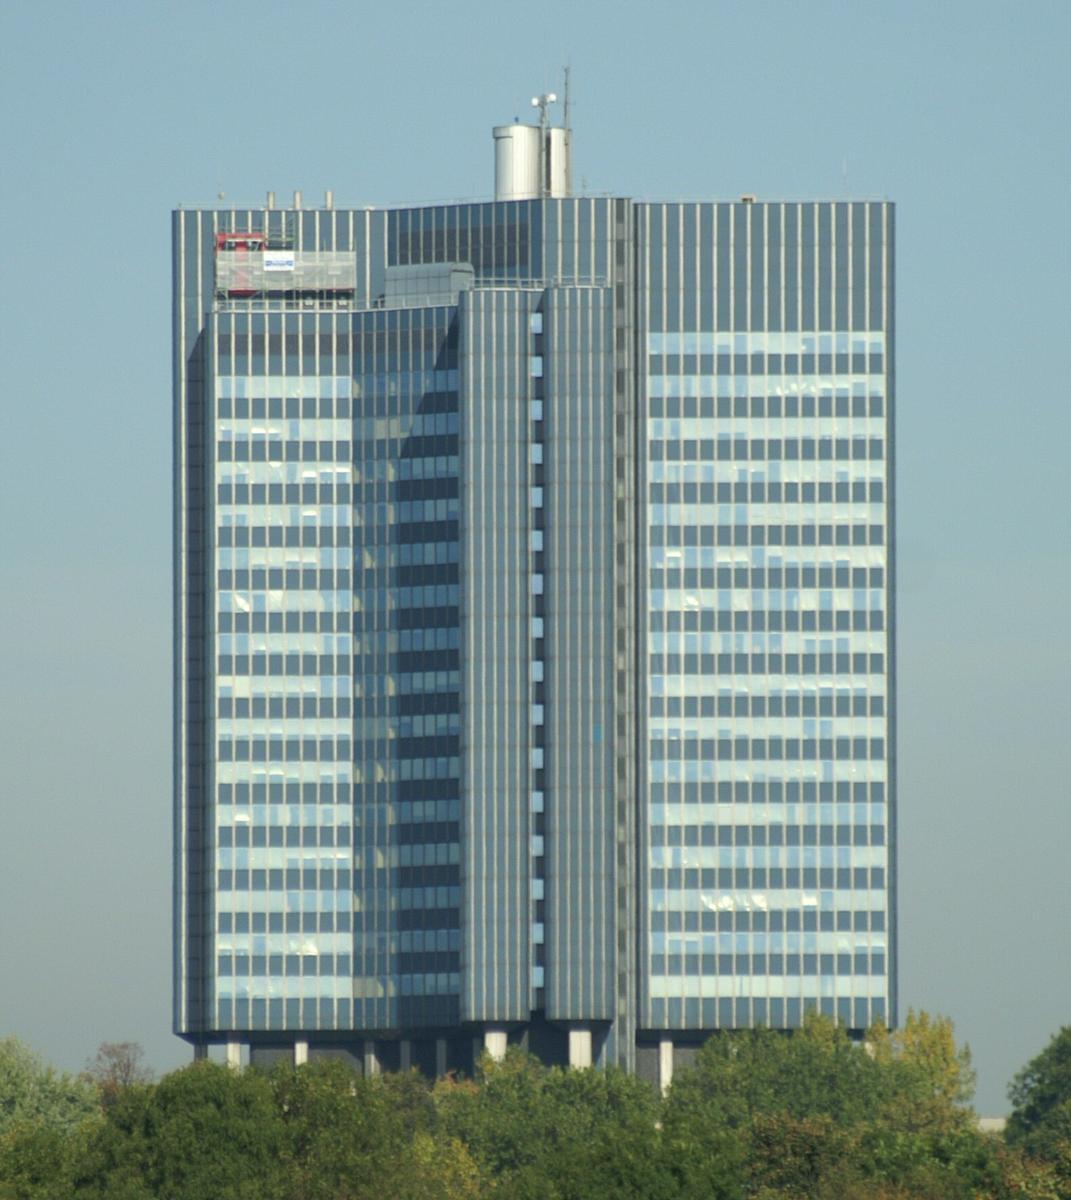 Image no. 48375 Telekom Tower Dortmund